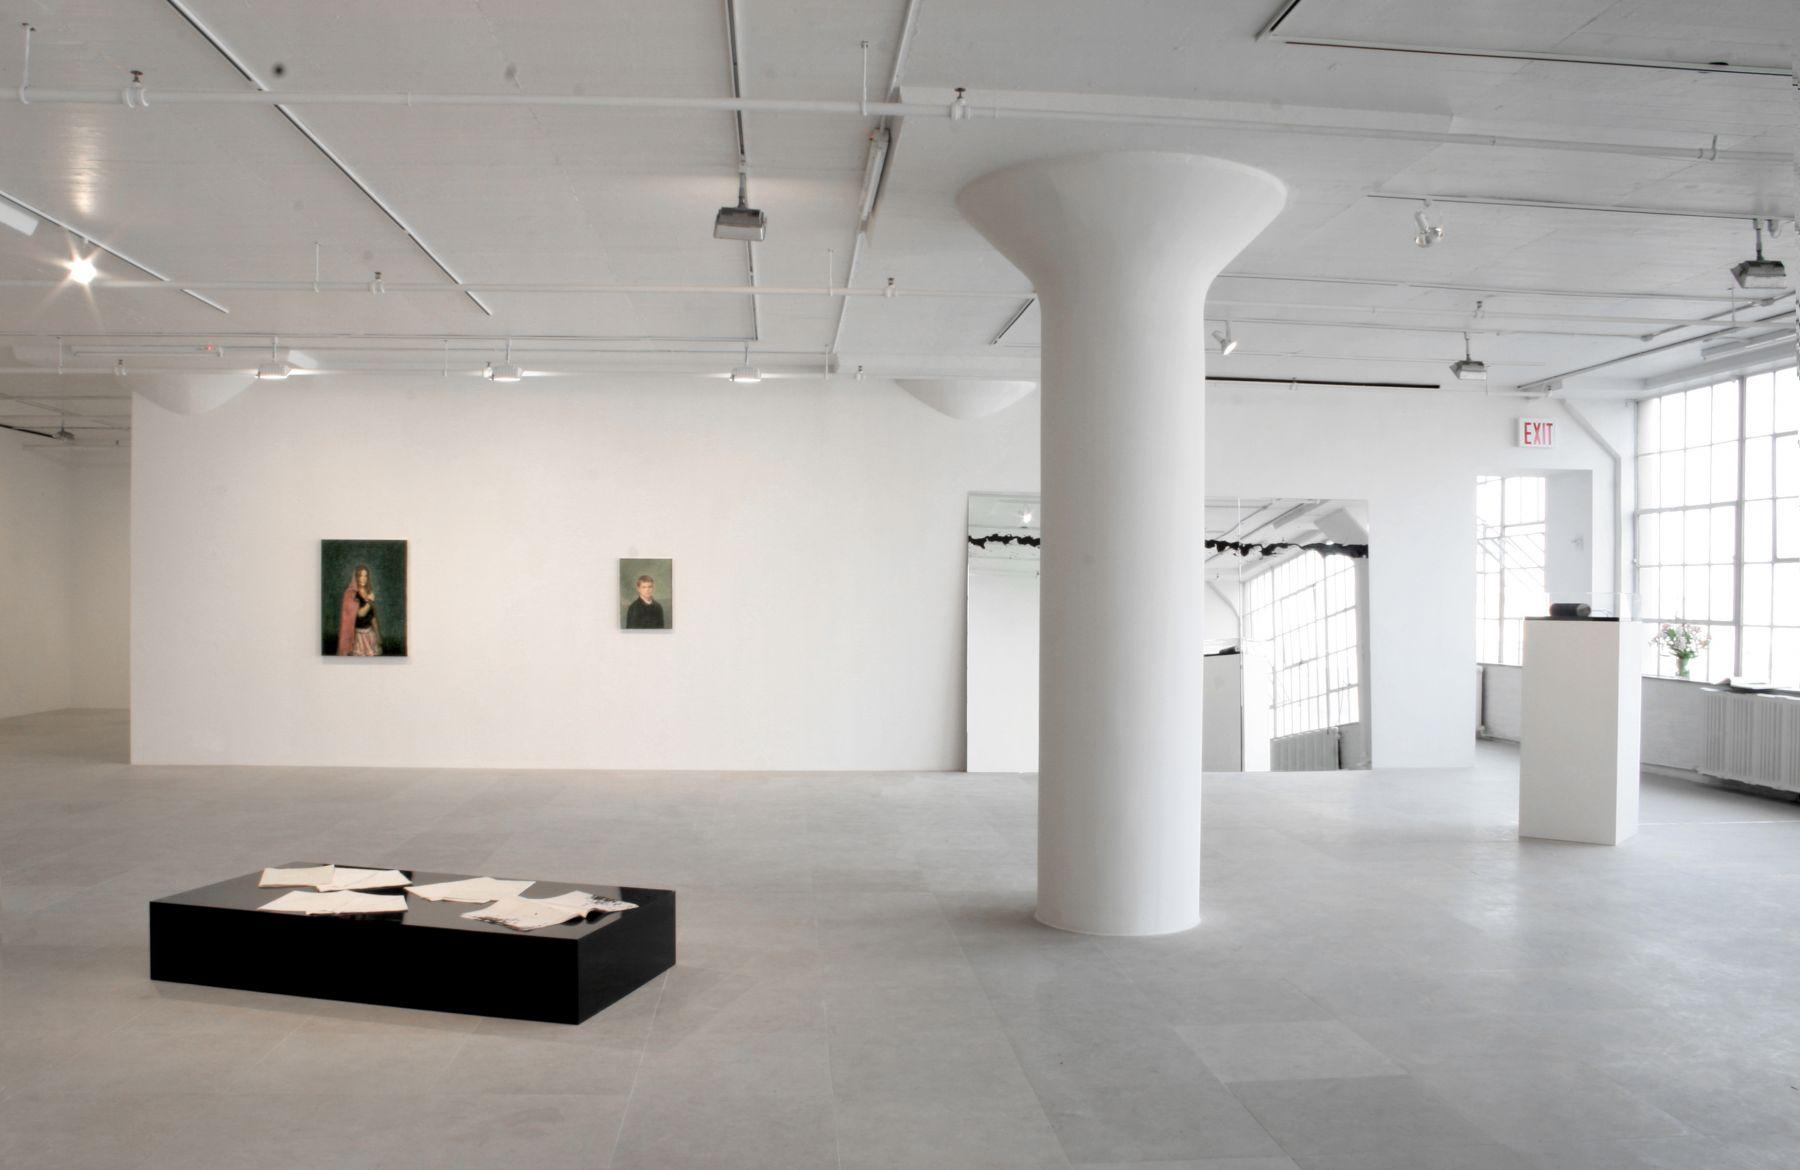 Installation view, Get Over Yourself, Greene Naftali, New York, 2006